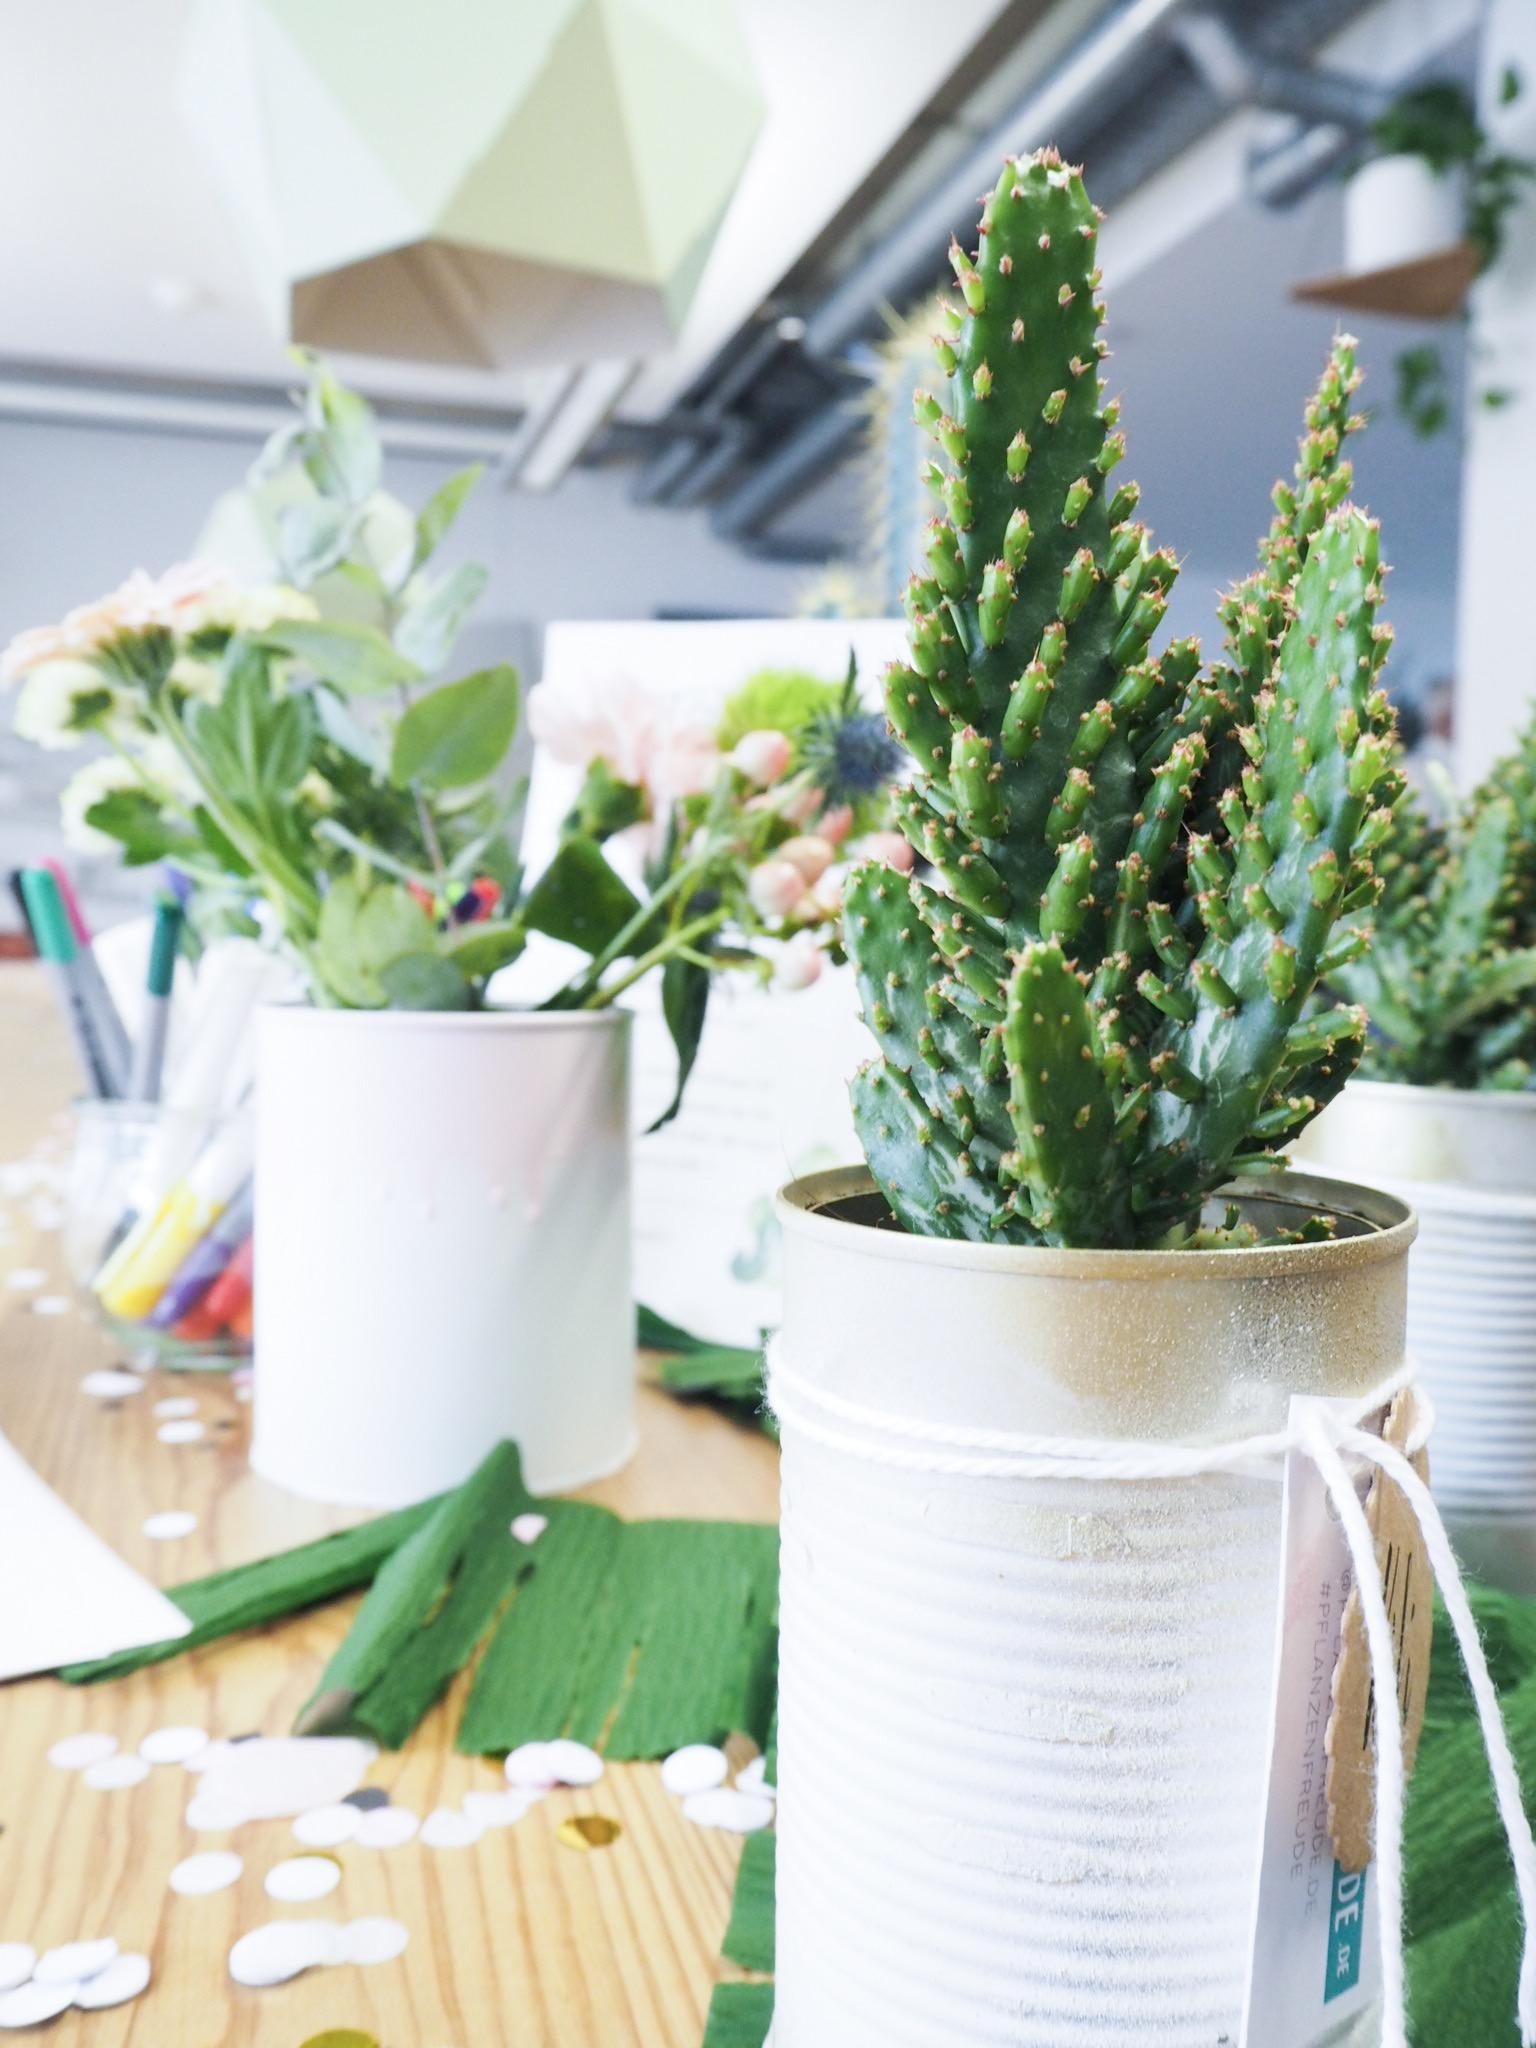 Kaktus Tischdeko mit echten Kakteen